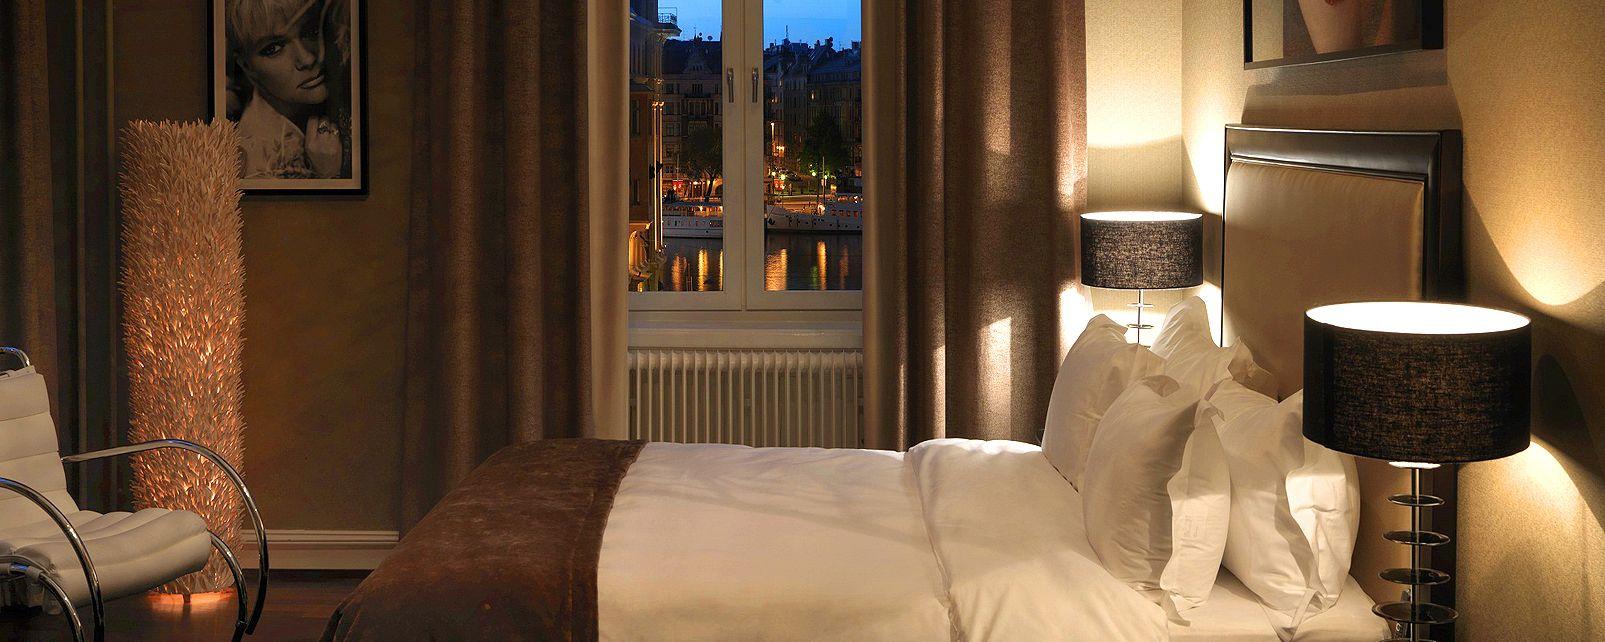 Hôtel Lydmar Hotel